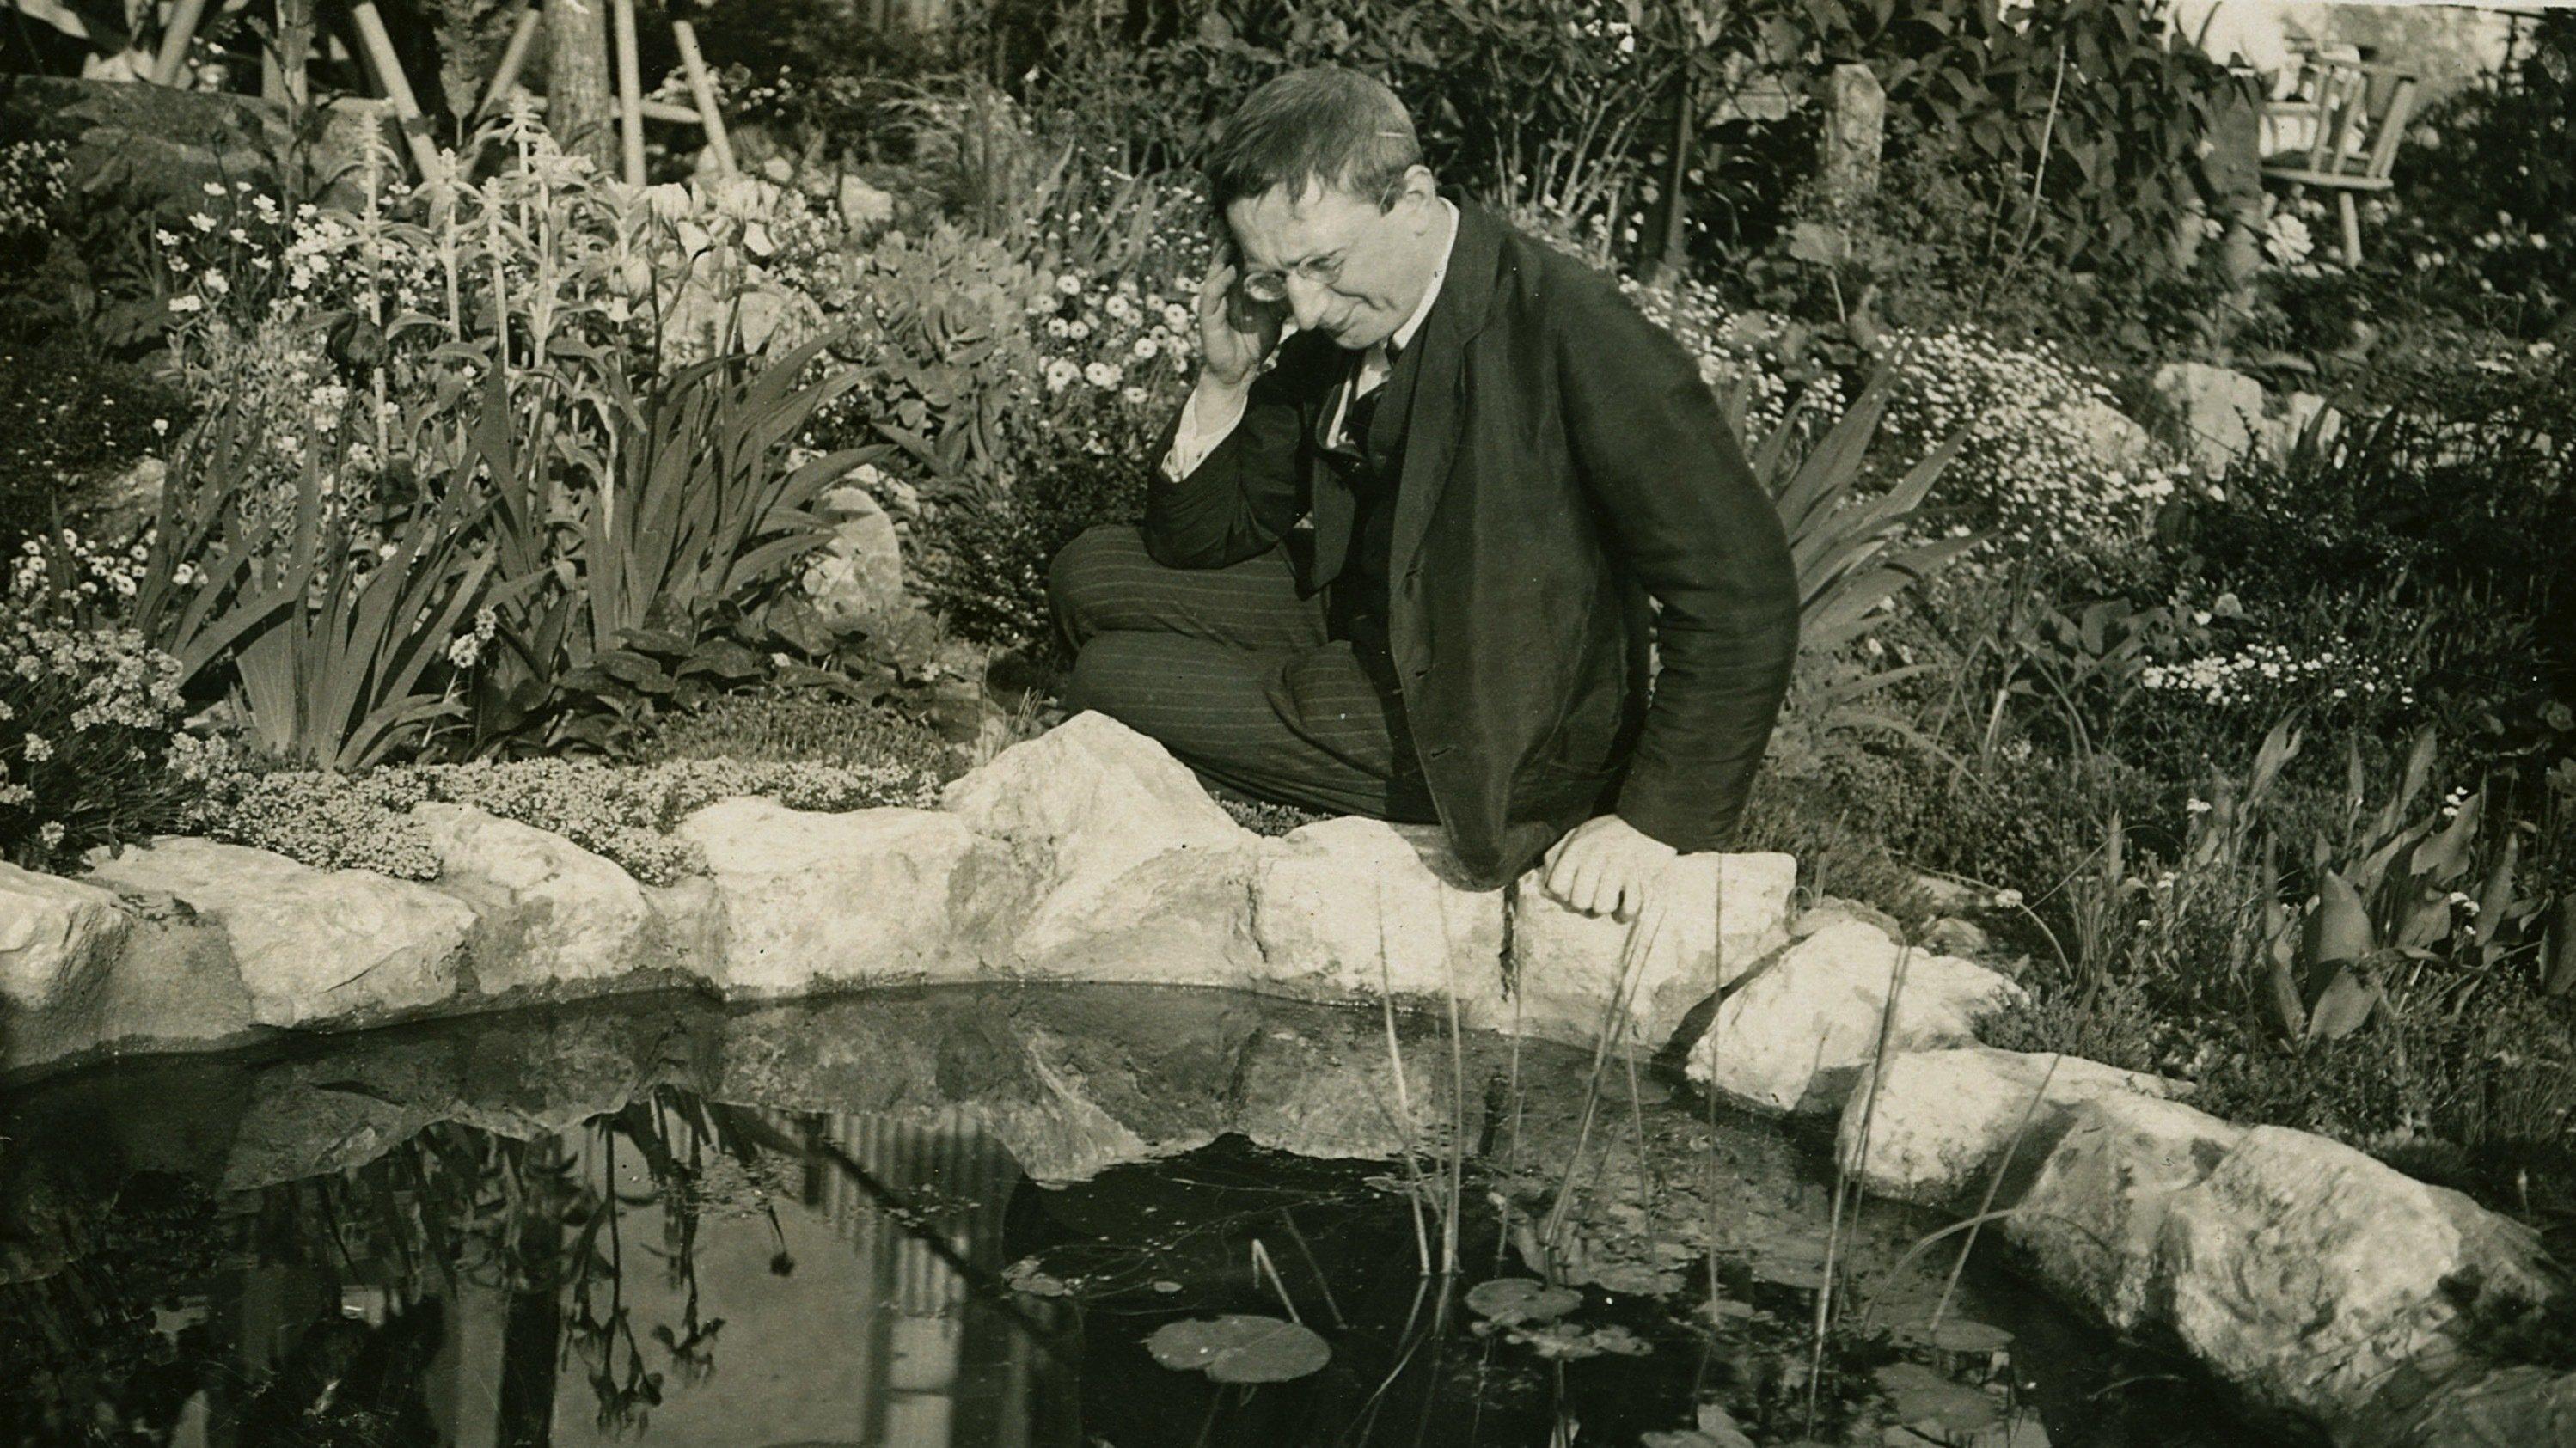 Der Schriftsteller Alfred Döblin sitzt an einem Brunnen.